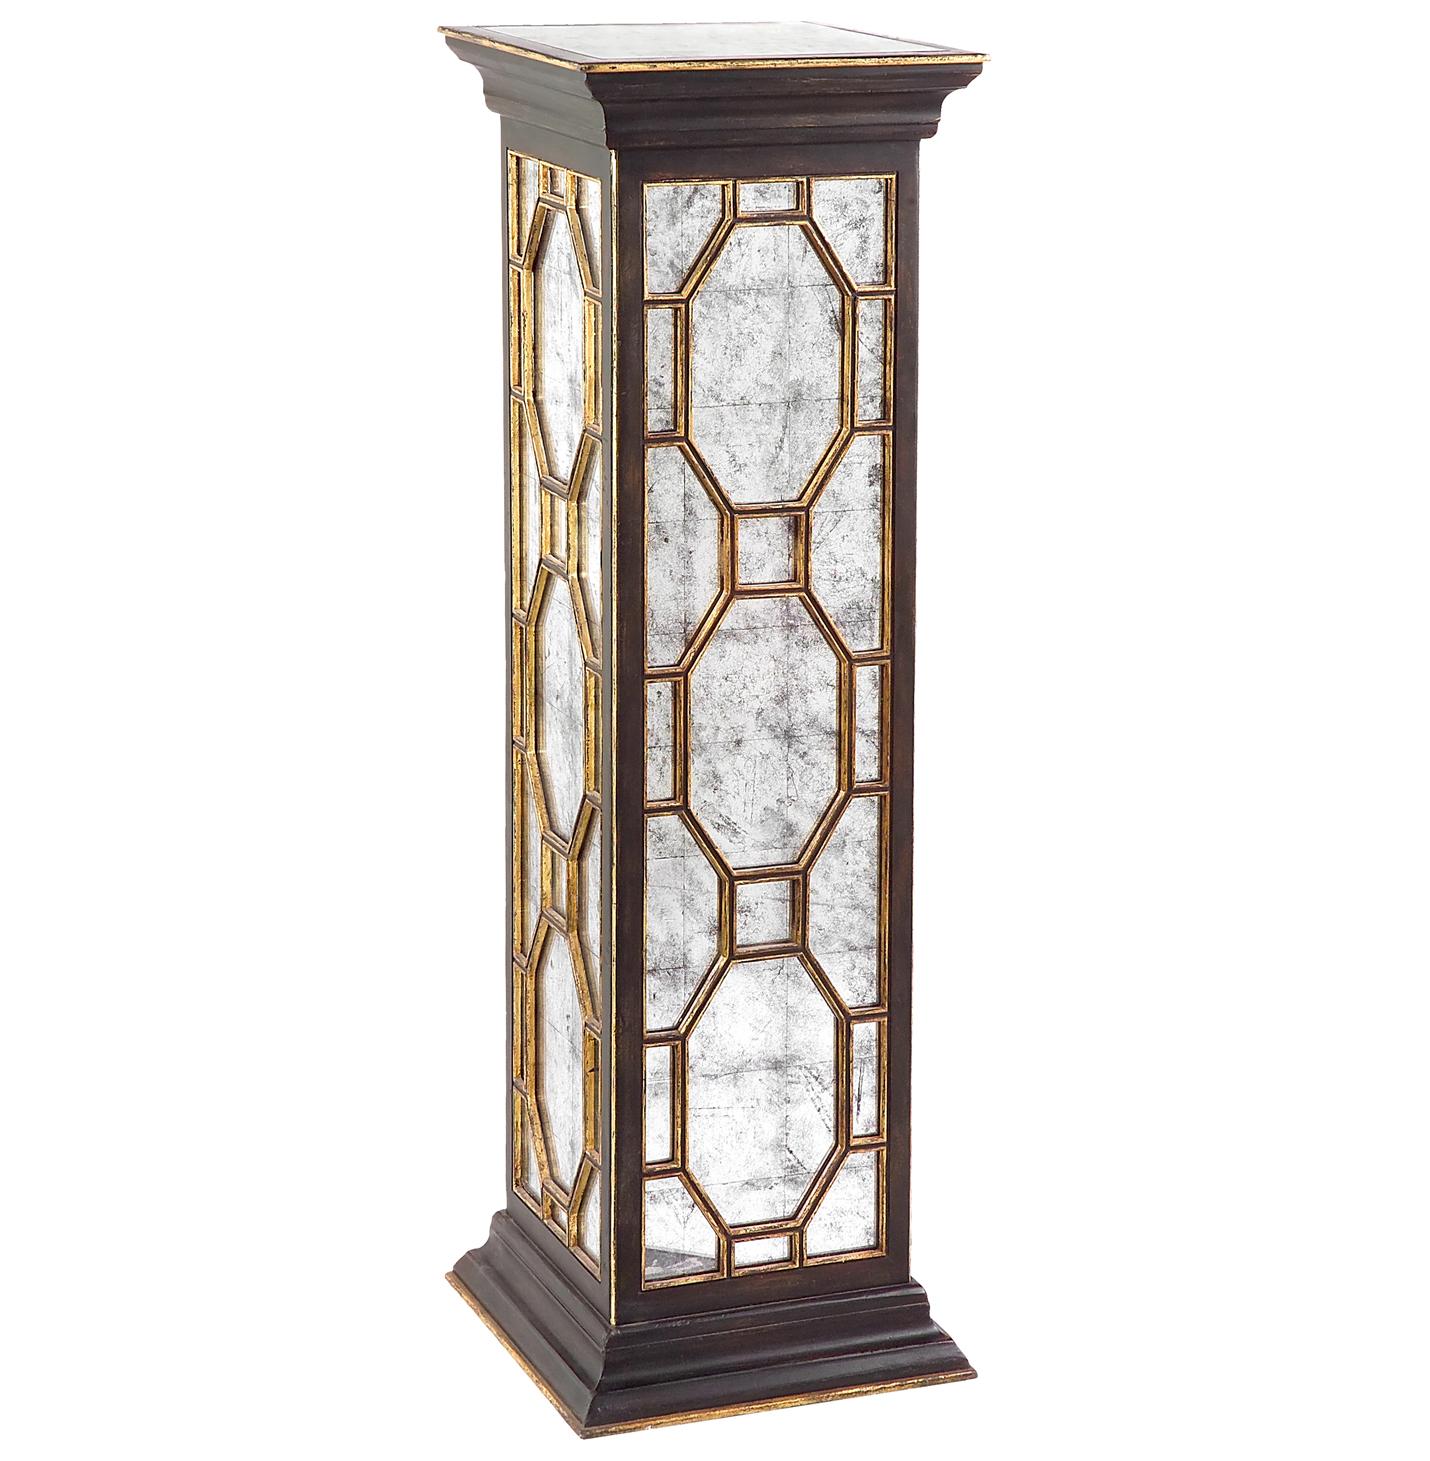 Cadence Traditional Hollywood Black Silver Leaf Mirror Pedestal Table - 48 Inch